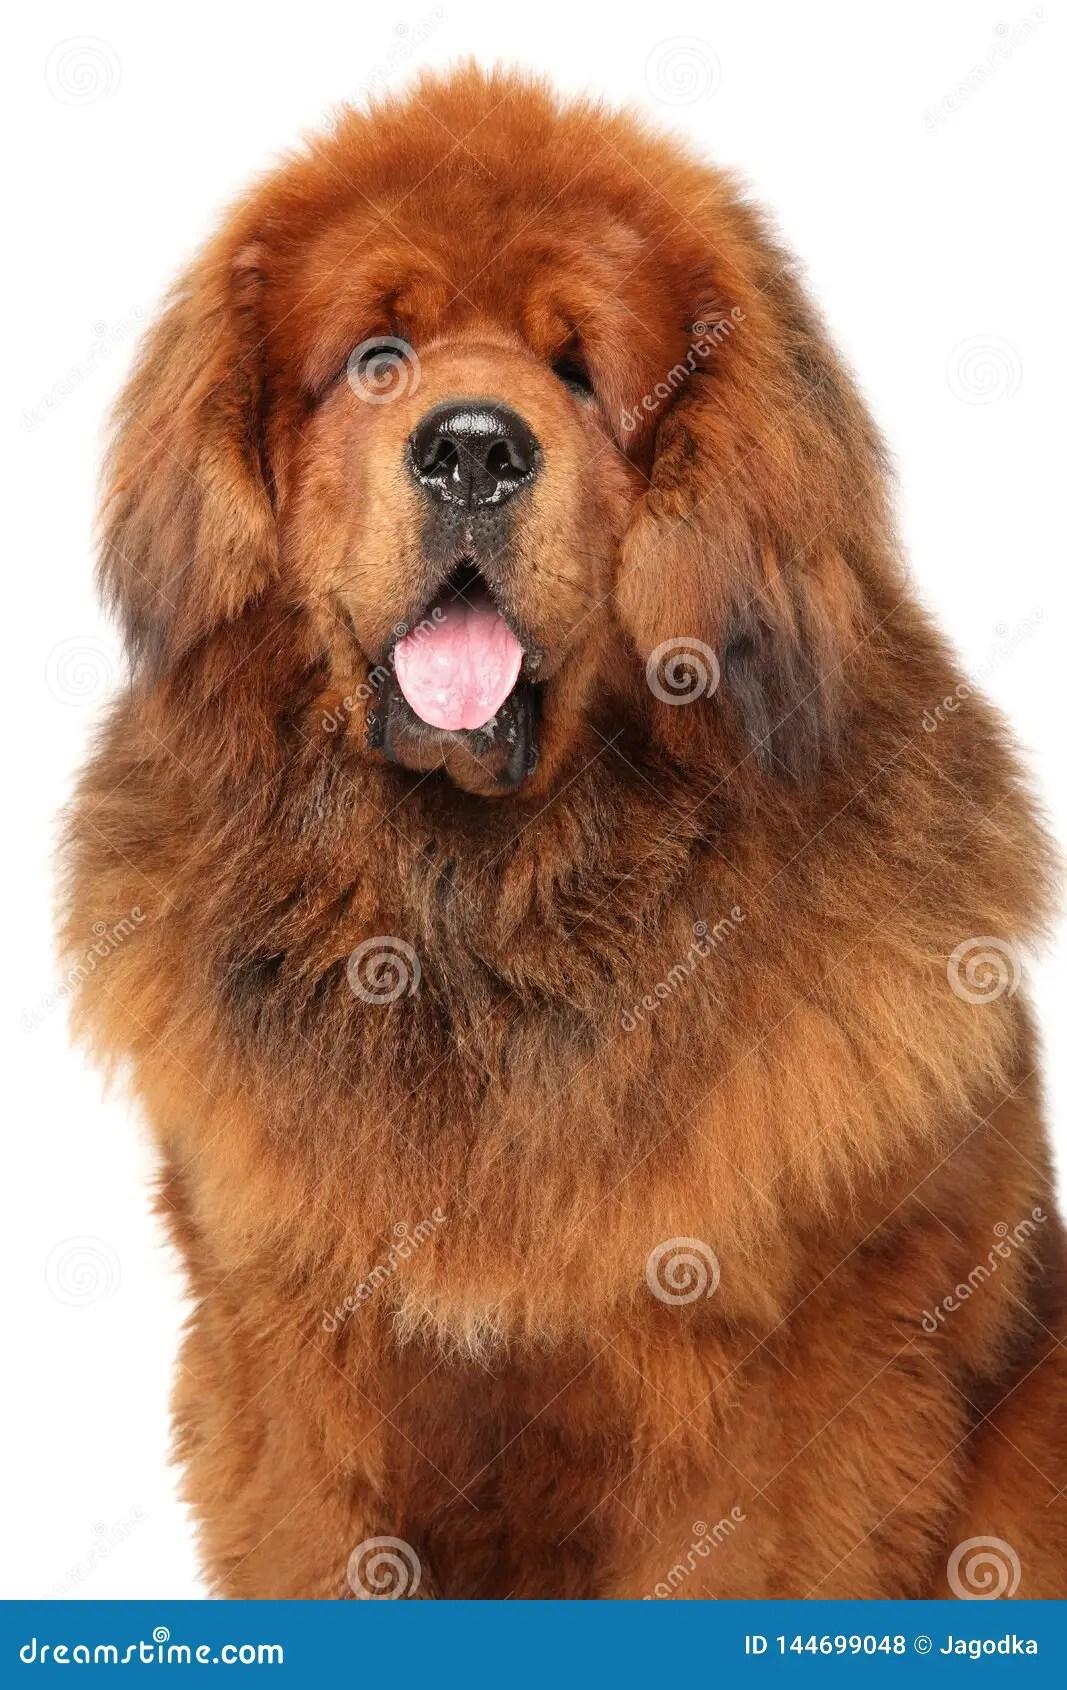 Portrait Of Huge Red Tibetan Mastiff Stock Photo - Image of portrait. animals: 144699048